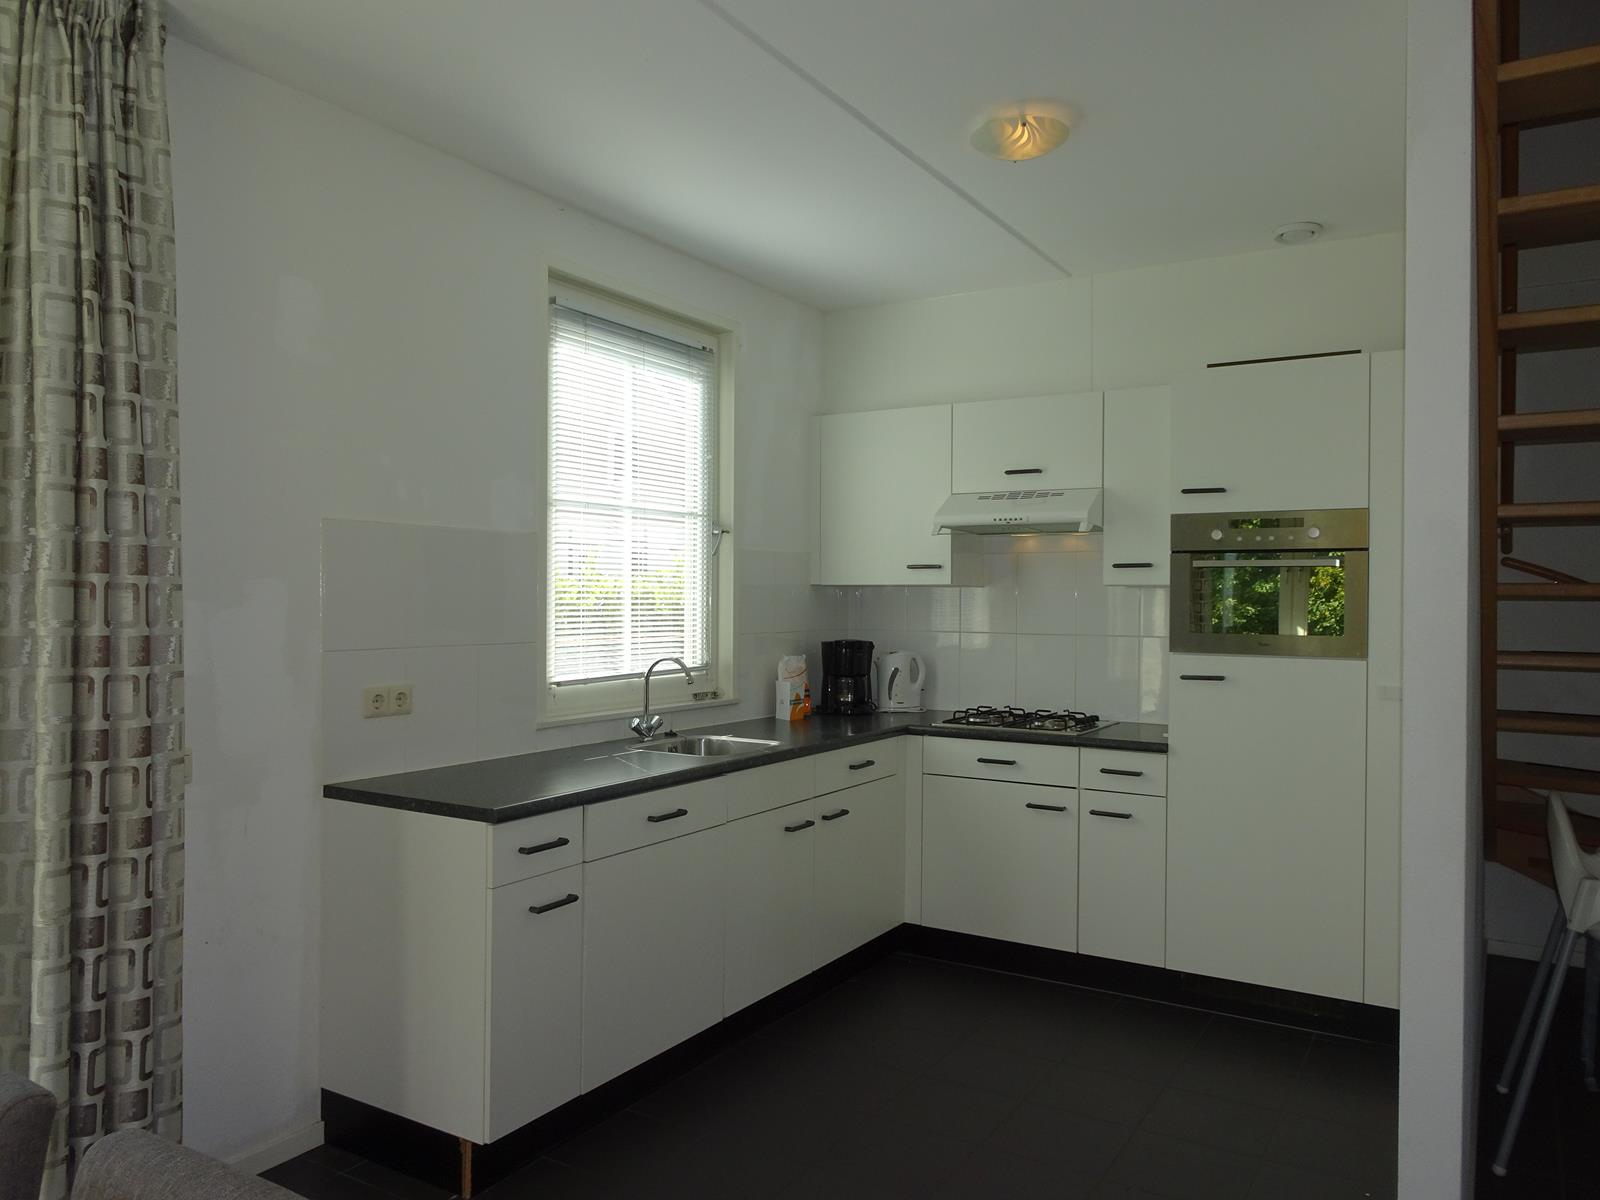 Vakantiehuis te koop Limburg Susteren Hommelweg 2 K801 (9).jpg